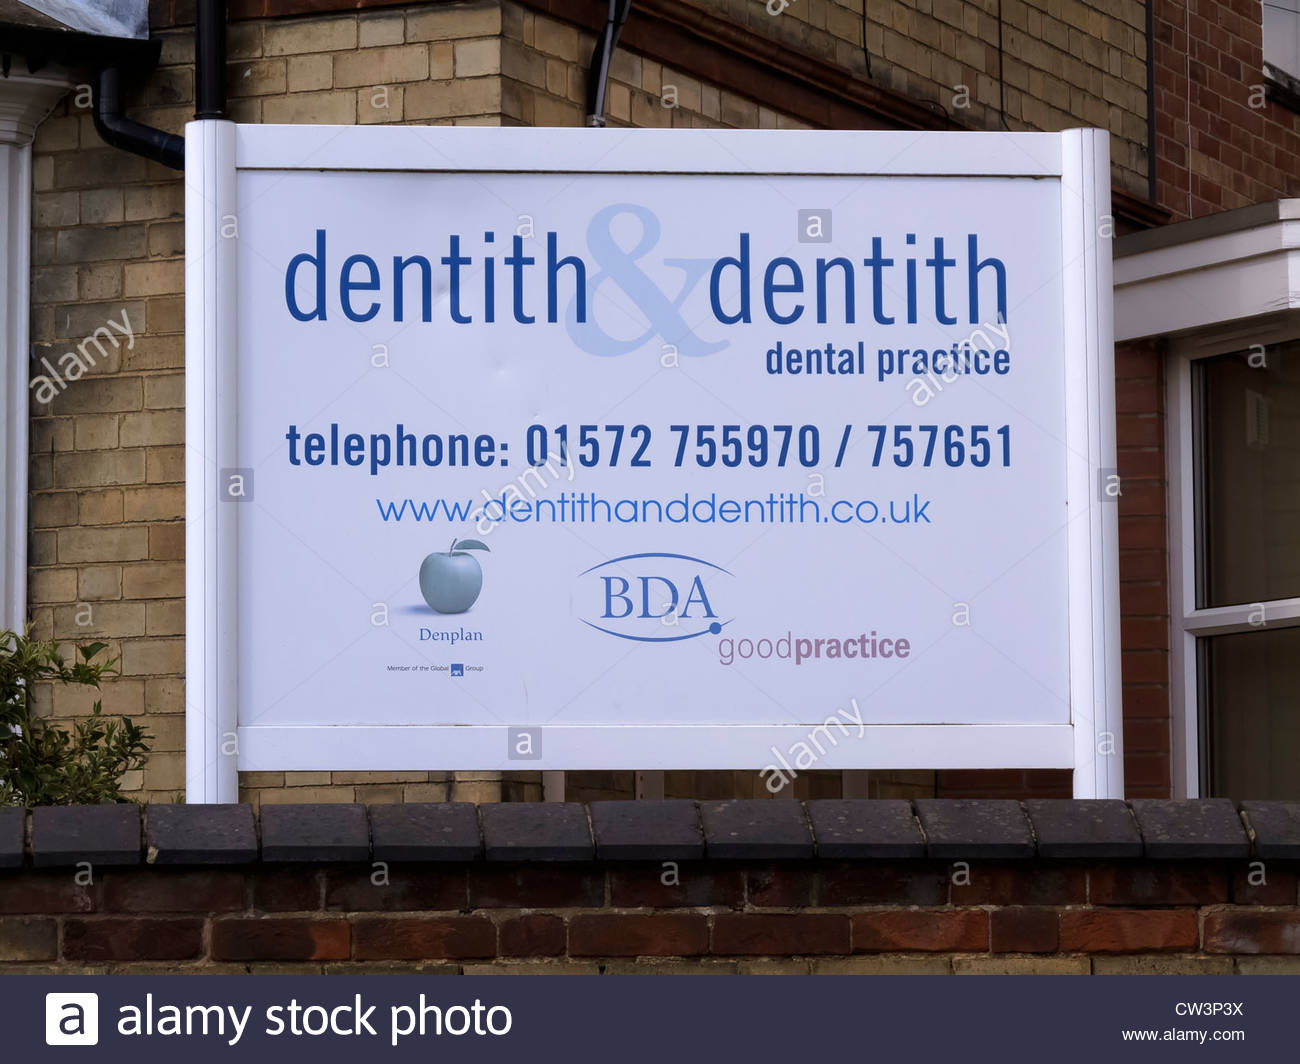 Amusing, humorous dentist's sign - Stock Image